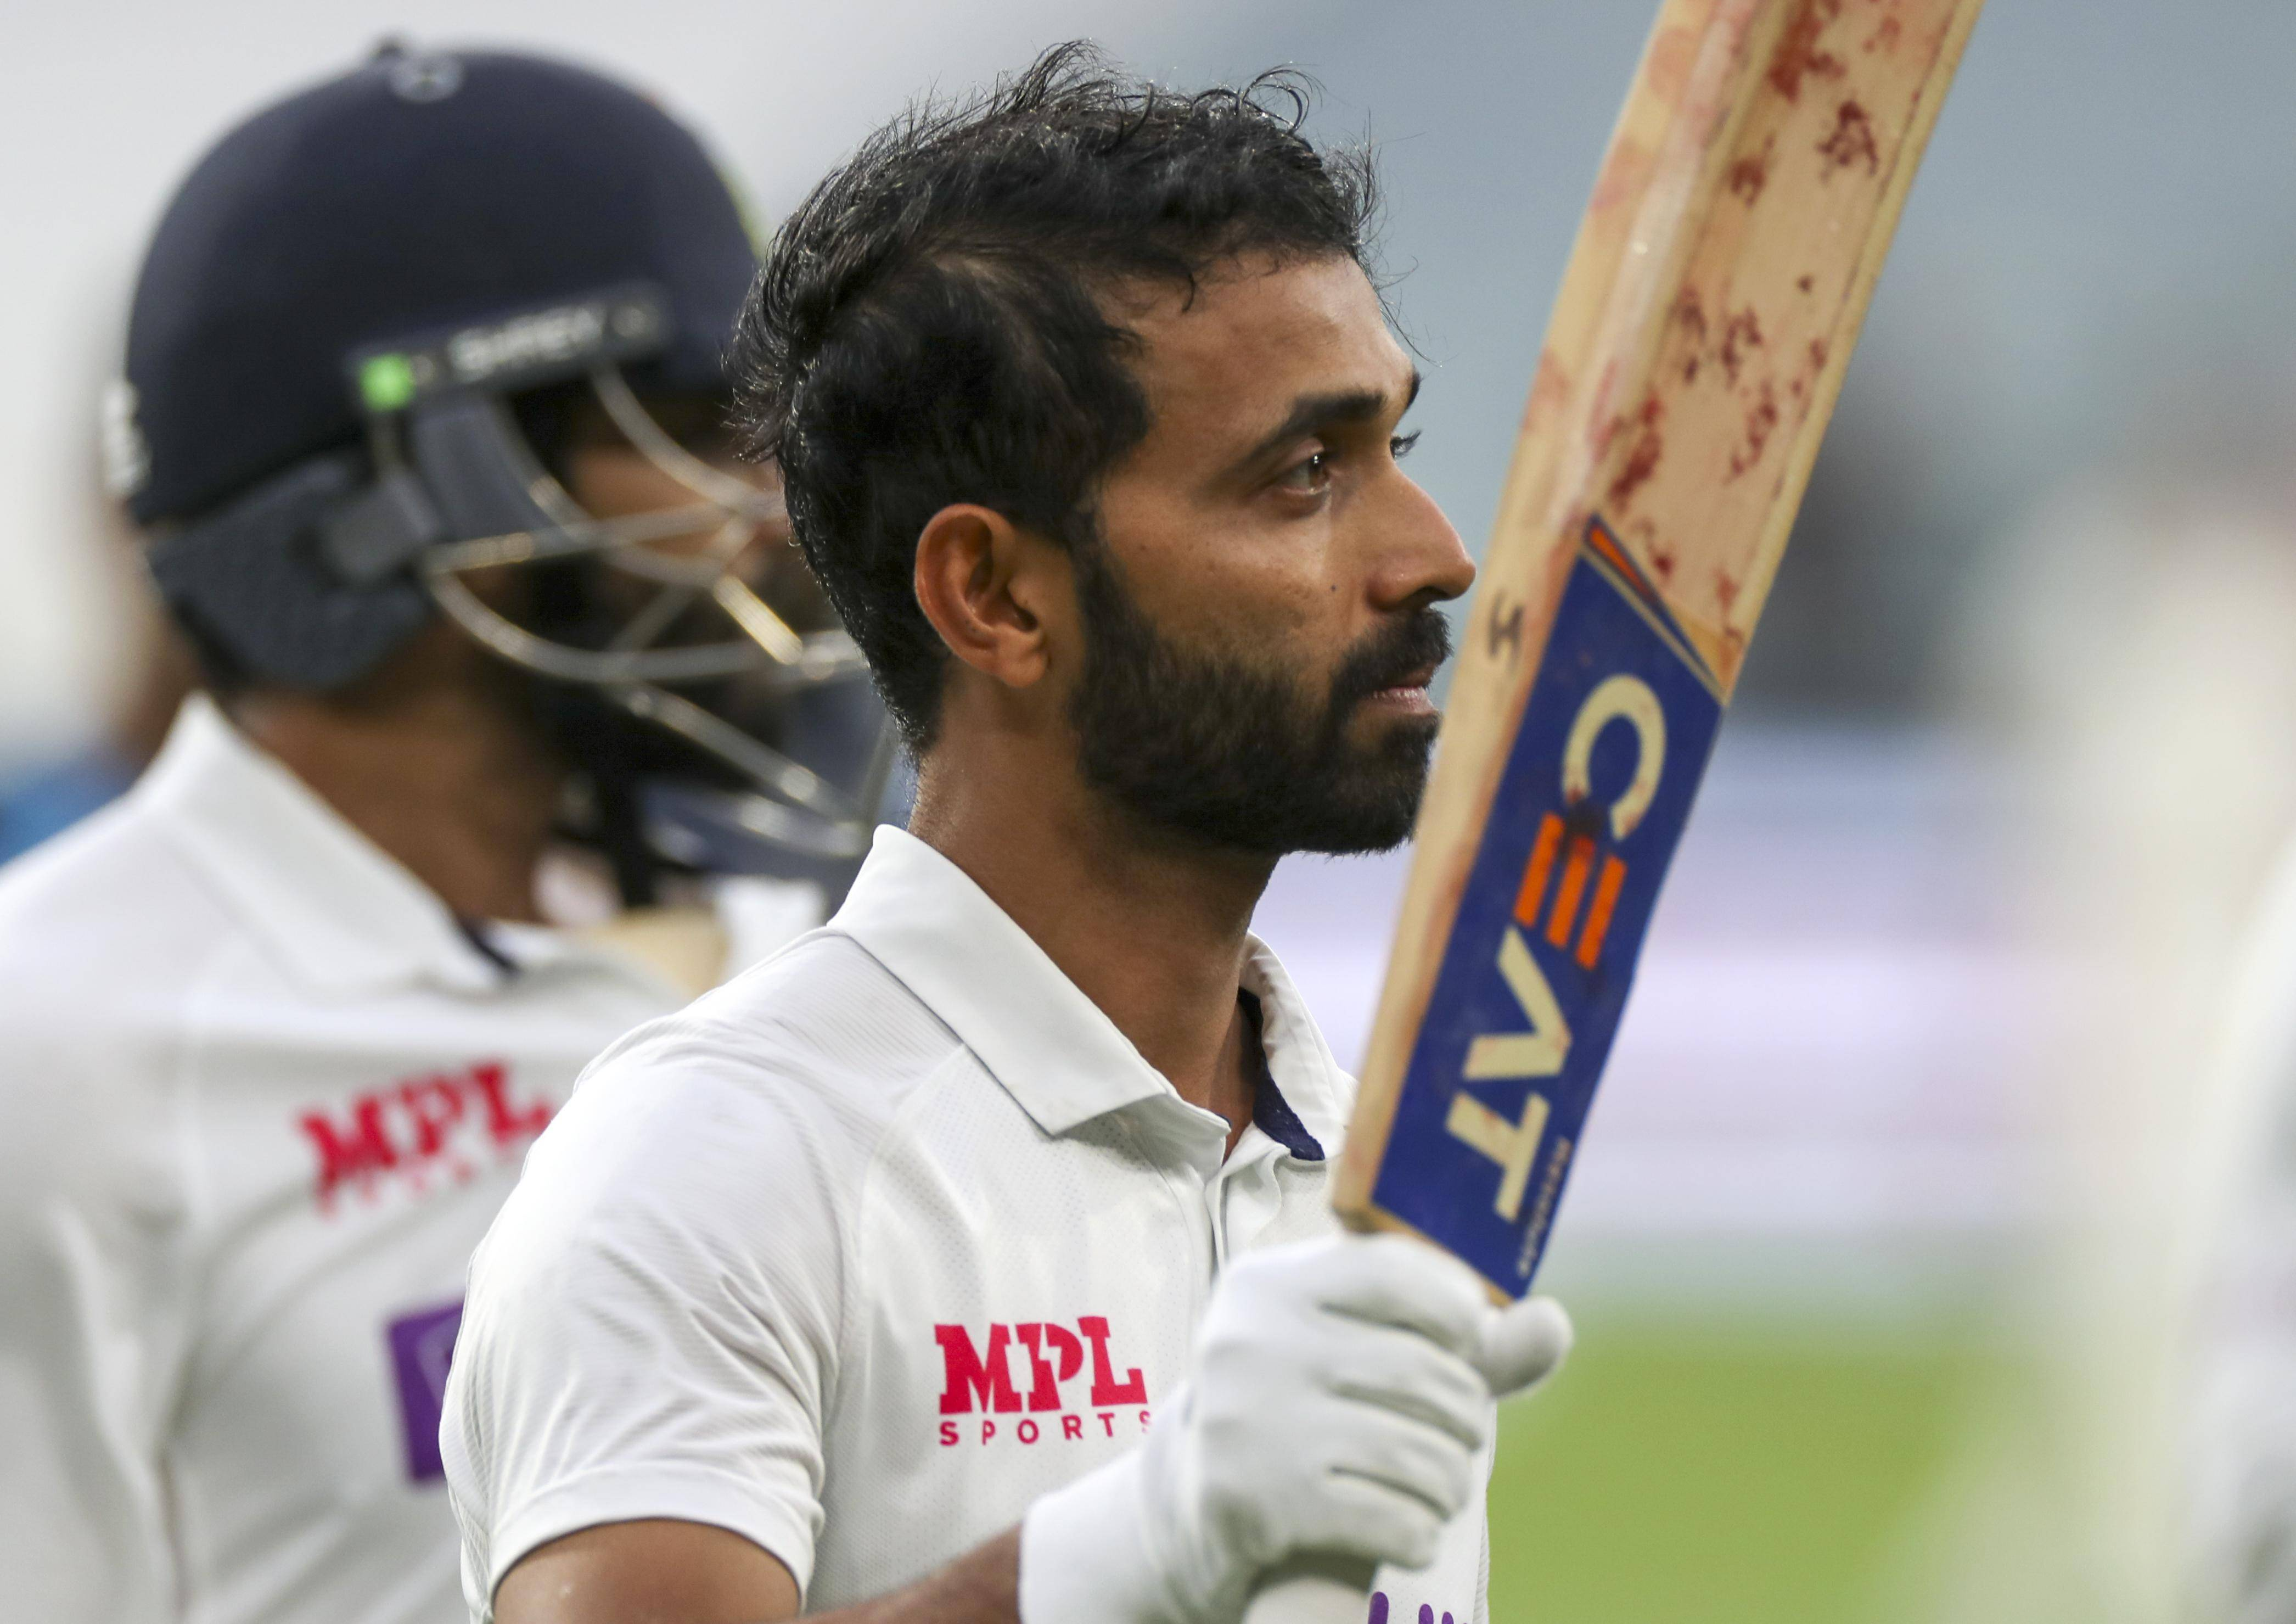 Australia vs India: Brilliant Rahane century puts India on top